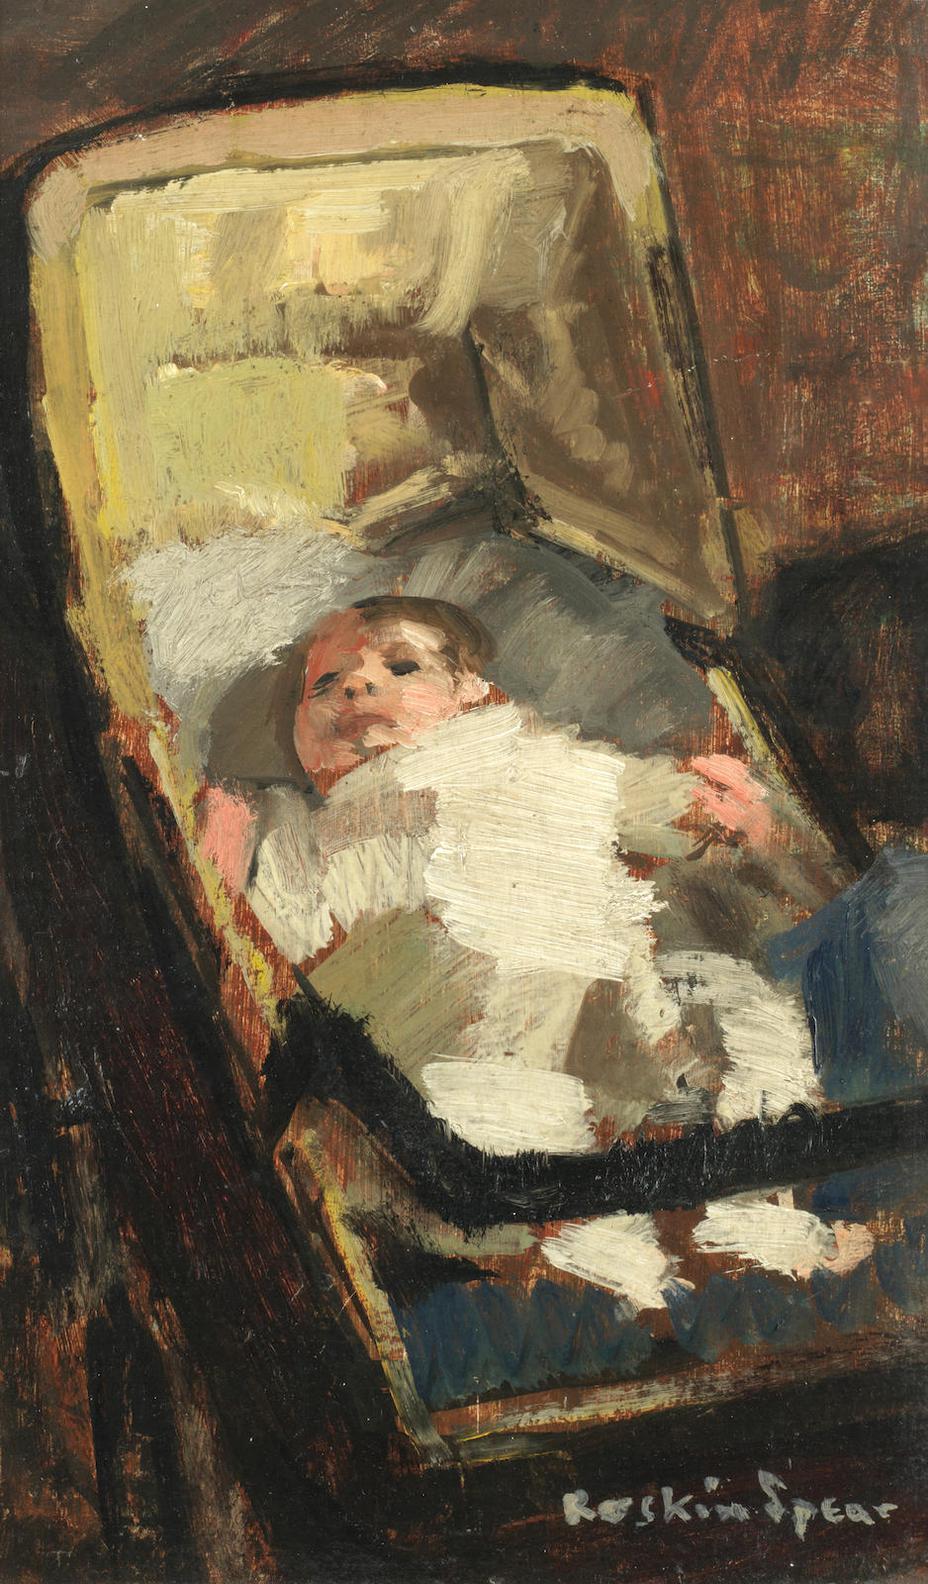 Ruskin Spear-Baby In Pram-1943